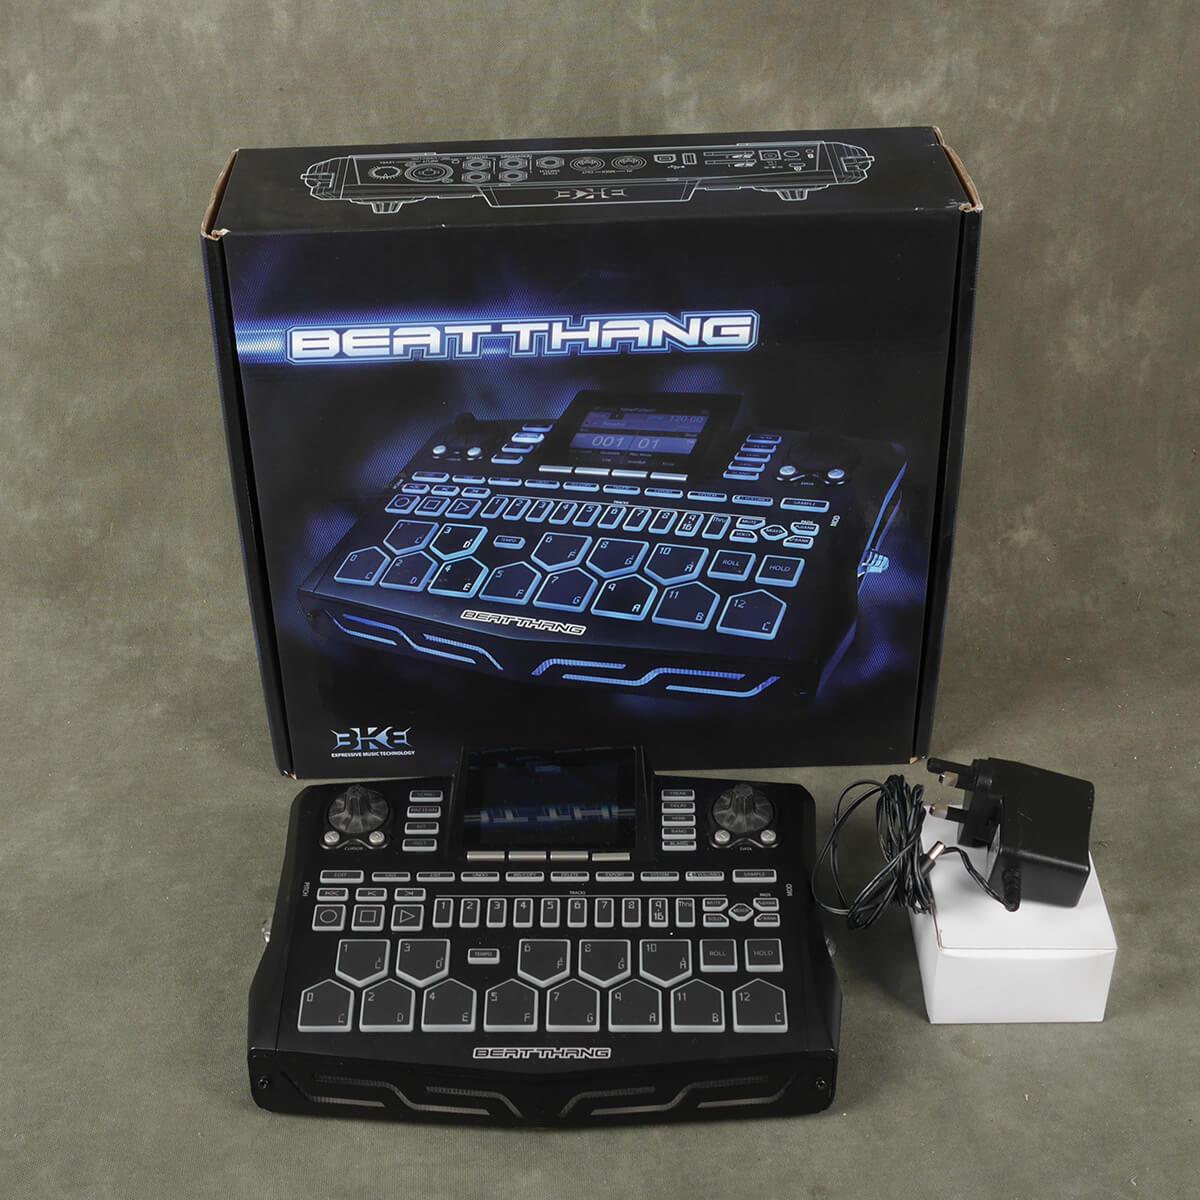 BKE Technology Beat Thang Sampler/Sequencer w/Box & PSU - 2nd Hand